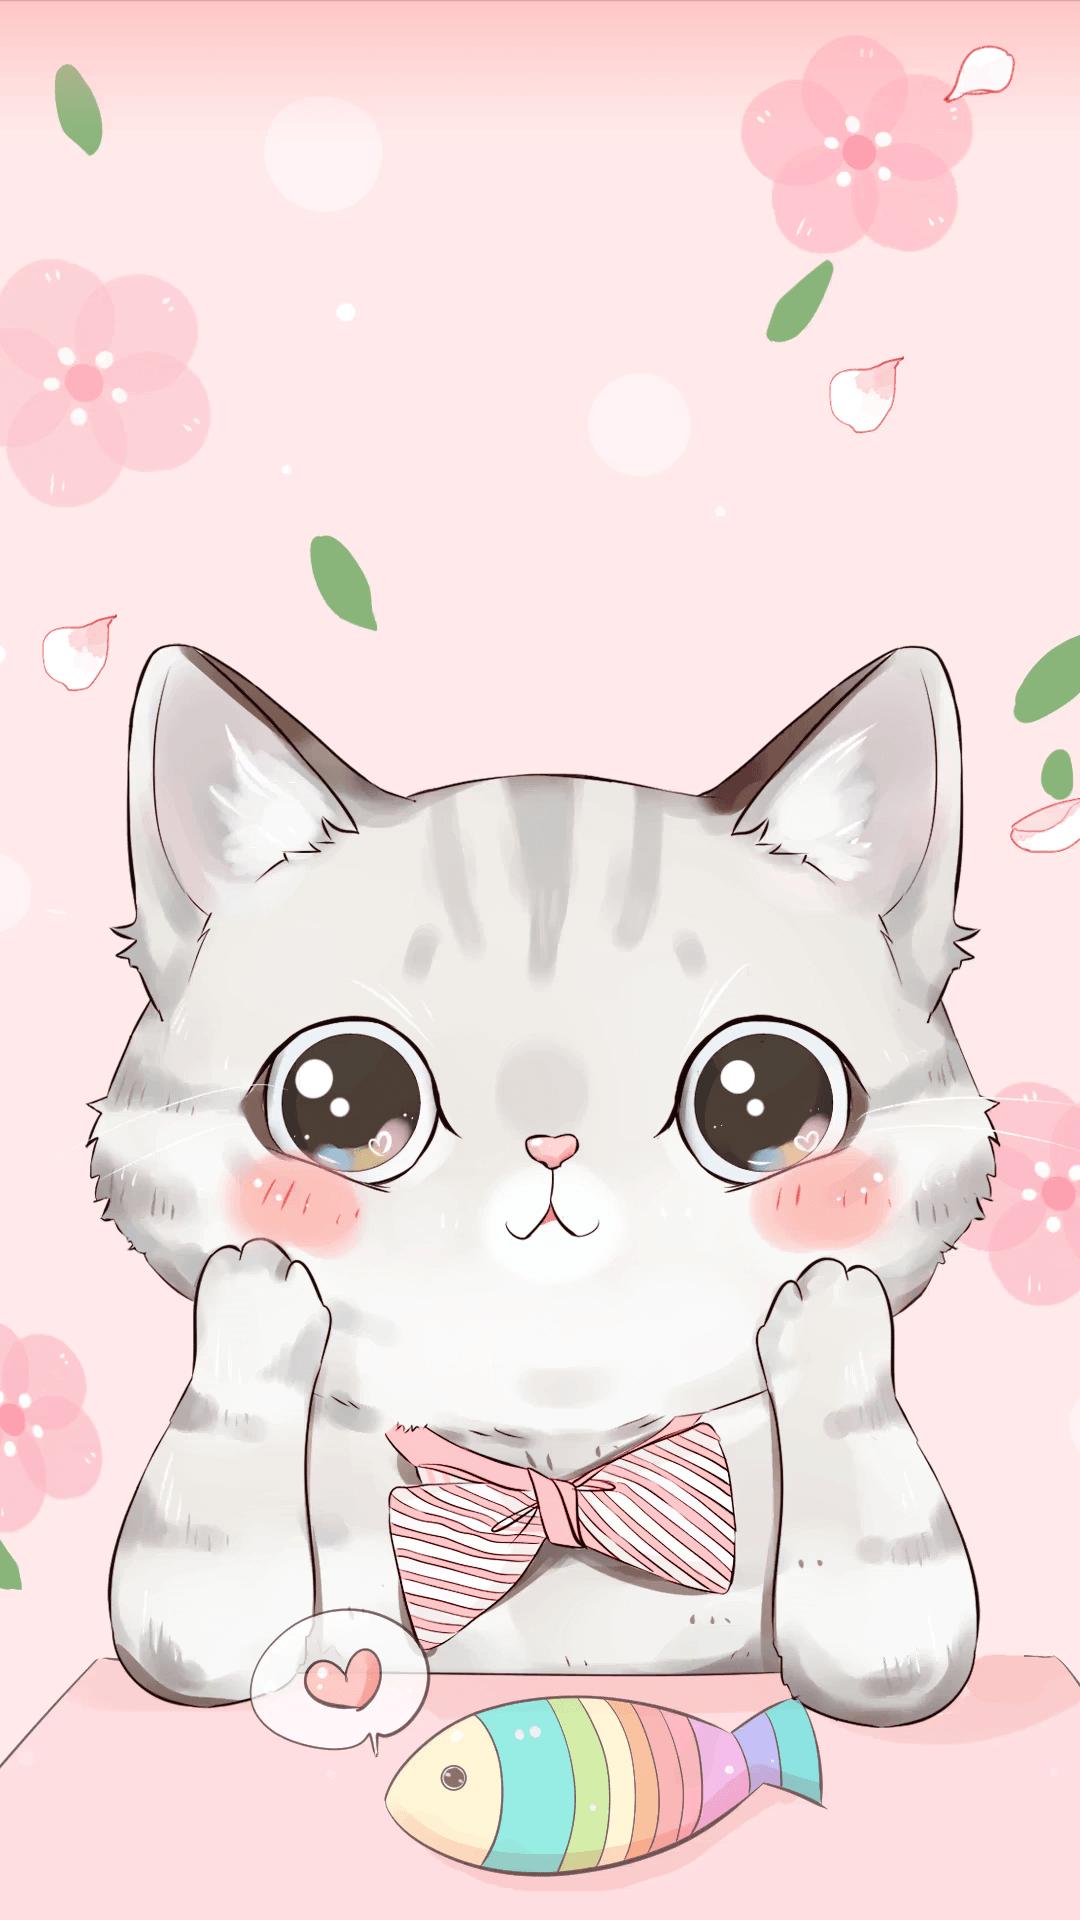 50+ Cartoon Pink Cats Wallpapers Download at